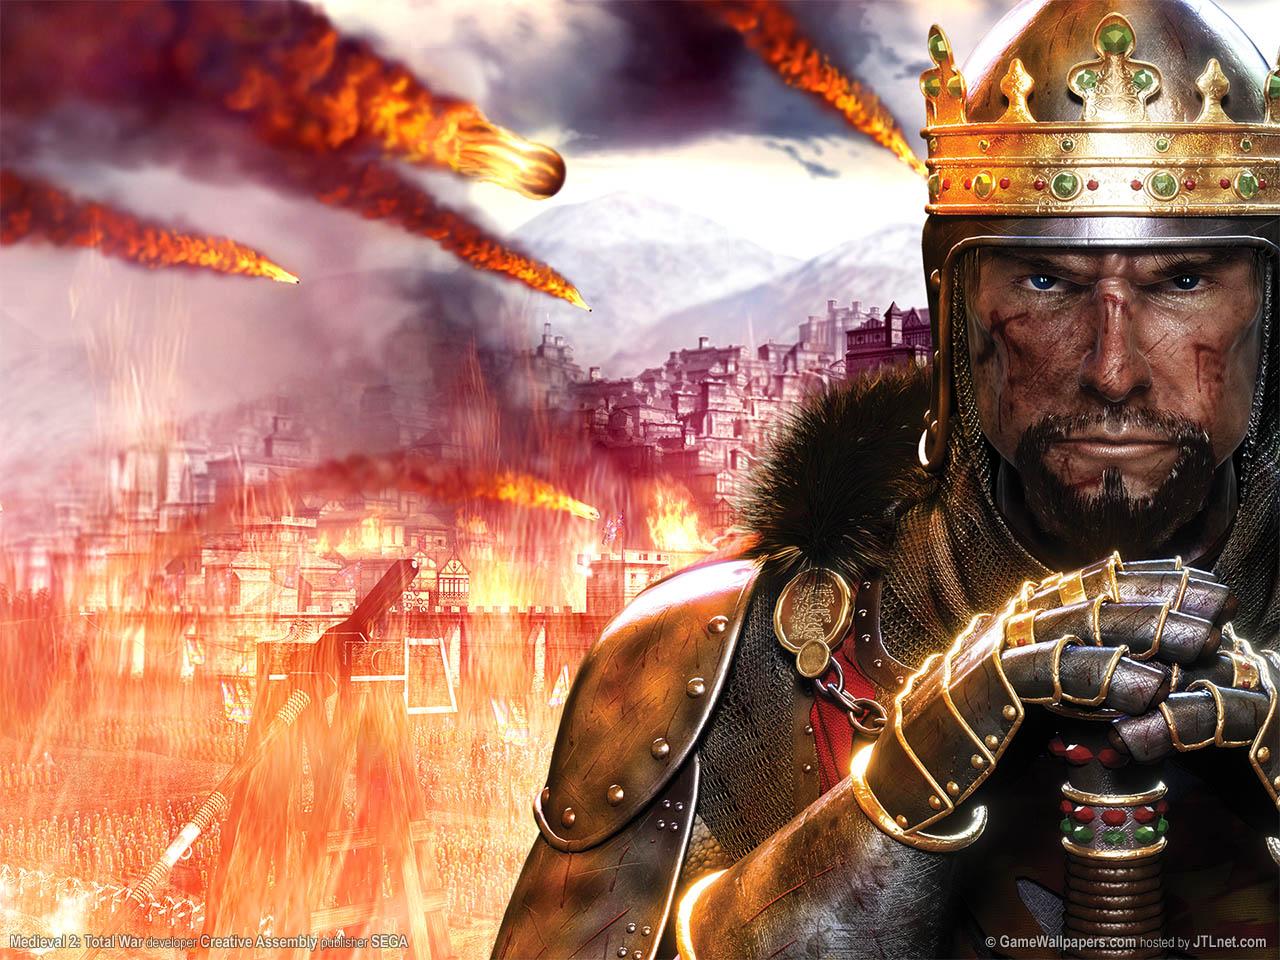 gamer background wallpapers medieval2 total war wallpaper 1280x960 jpg 1280x960